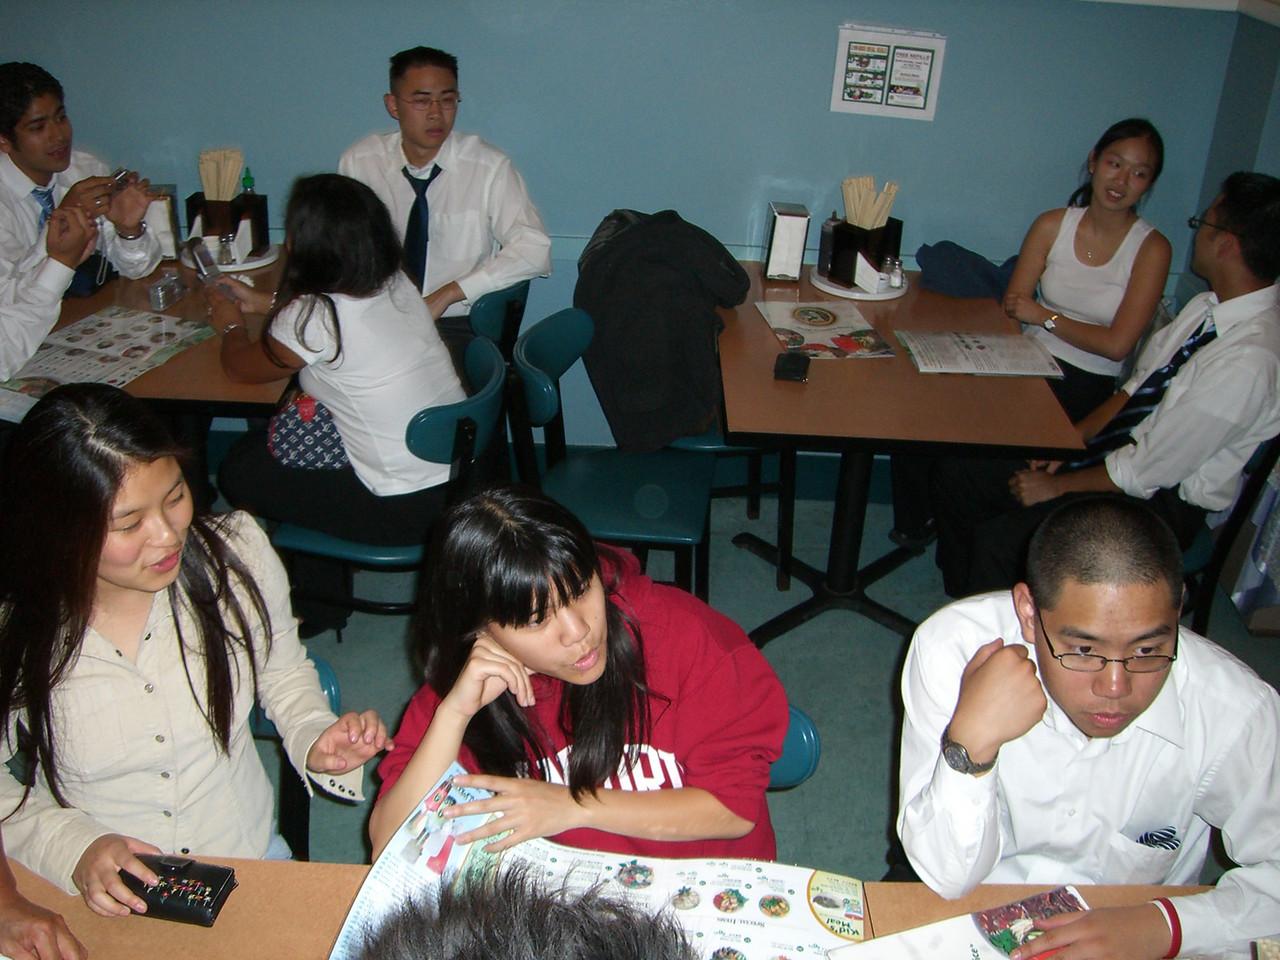 2005 10 22 Sat - Candid Jenn Kim, LeAann Duong, & David Chiang from above